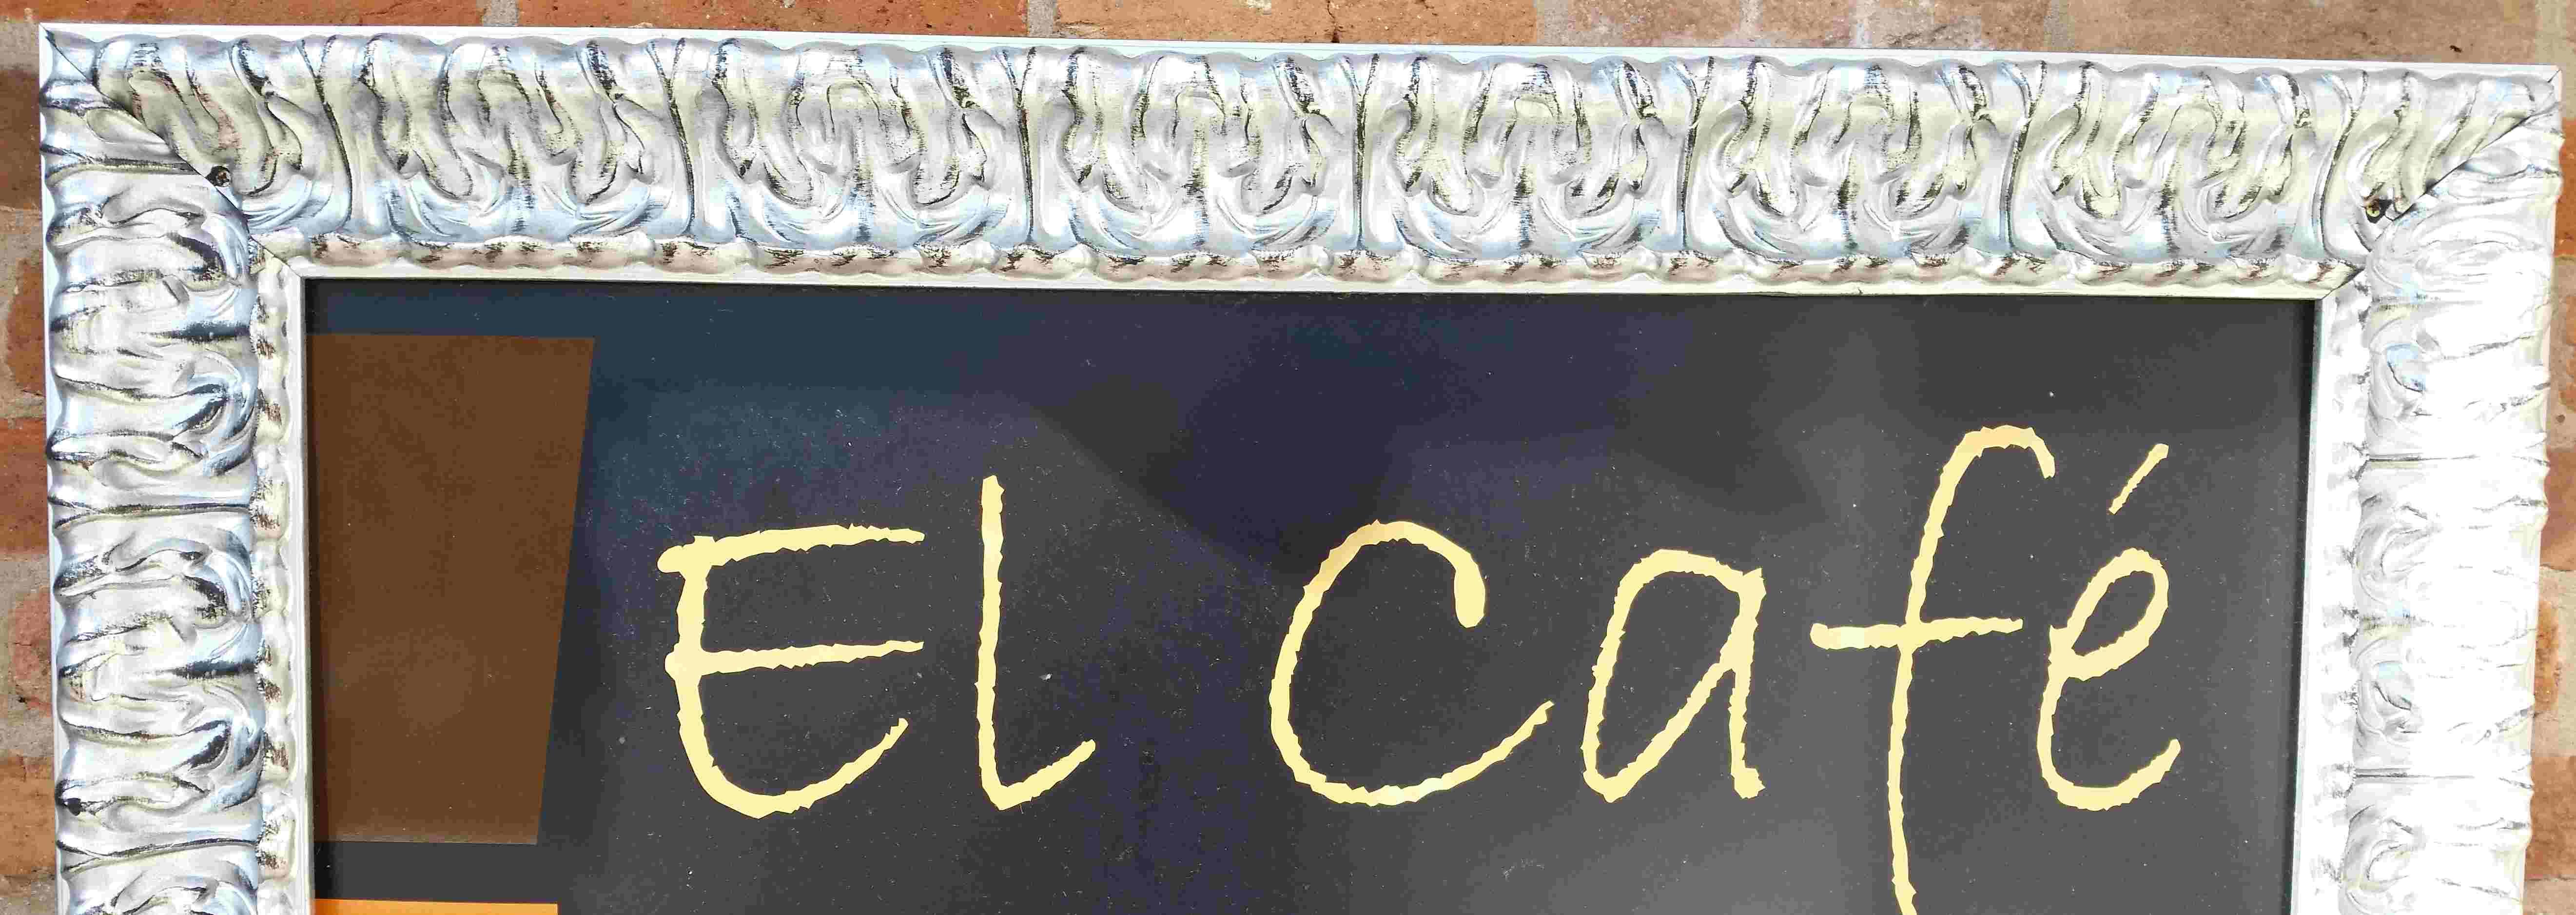 El Cafe', an excellent tapas bar in Shipston on Sour